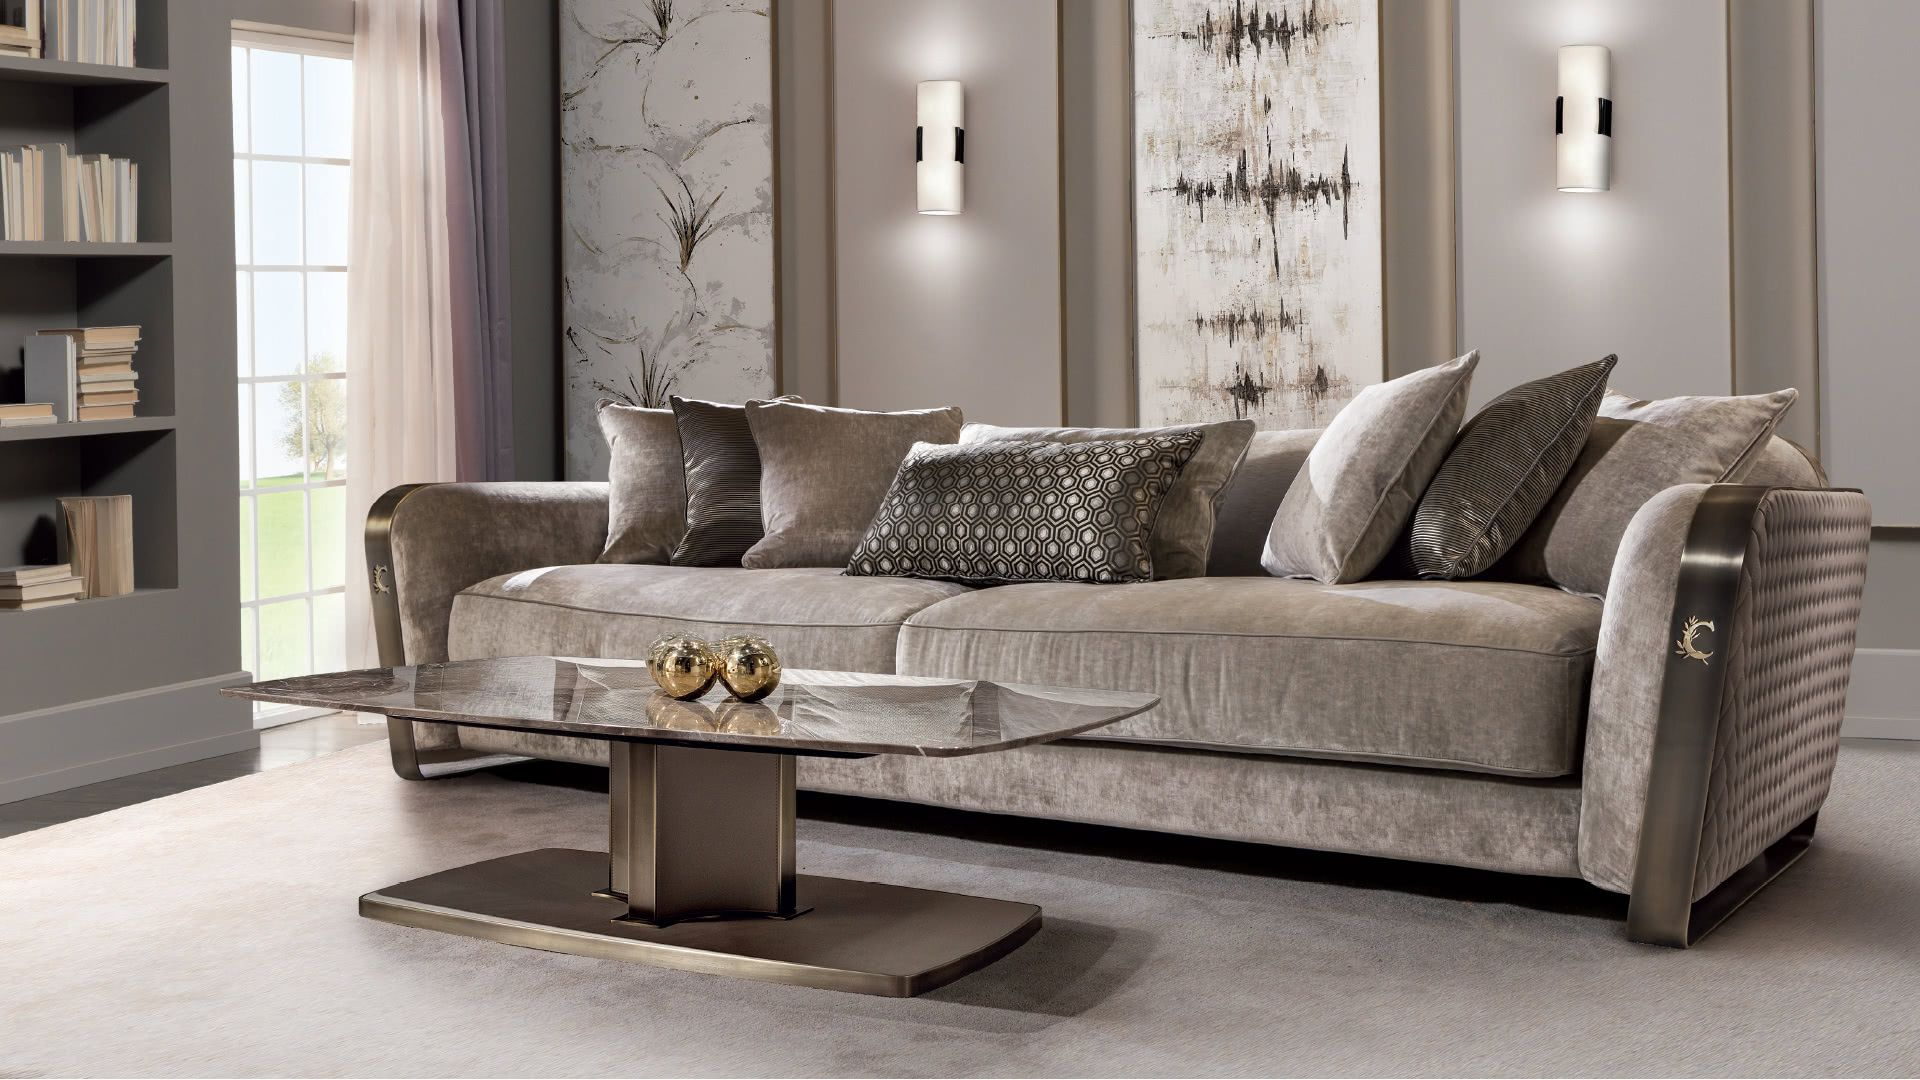 Voyage Cantori Furniture sofa Pinterest